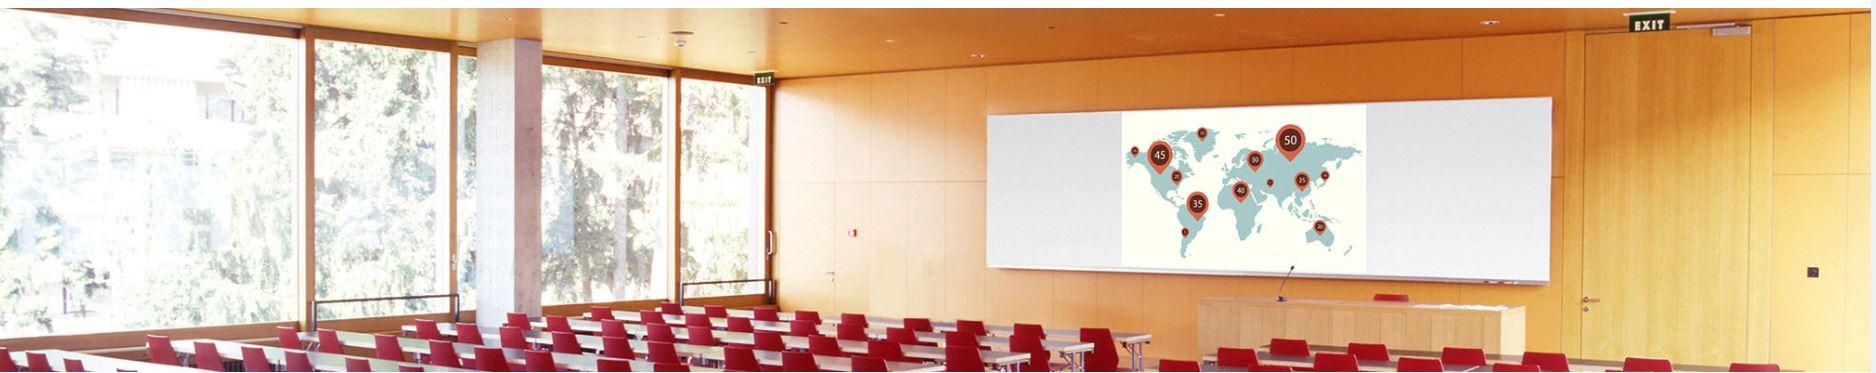 Videoproiector Sony VPL-FHZ120/B sala clasa